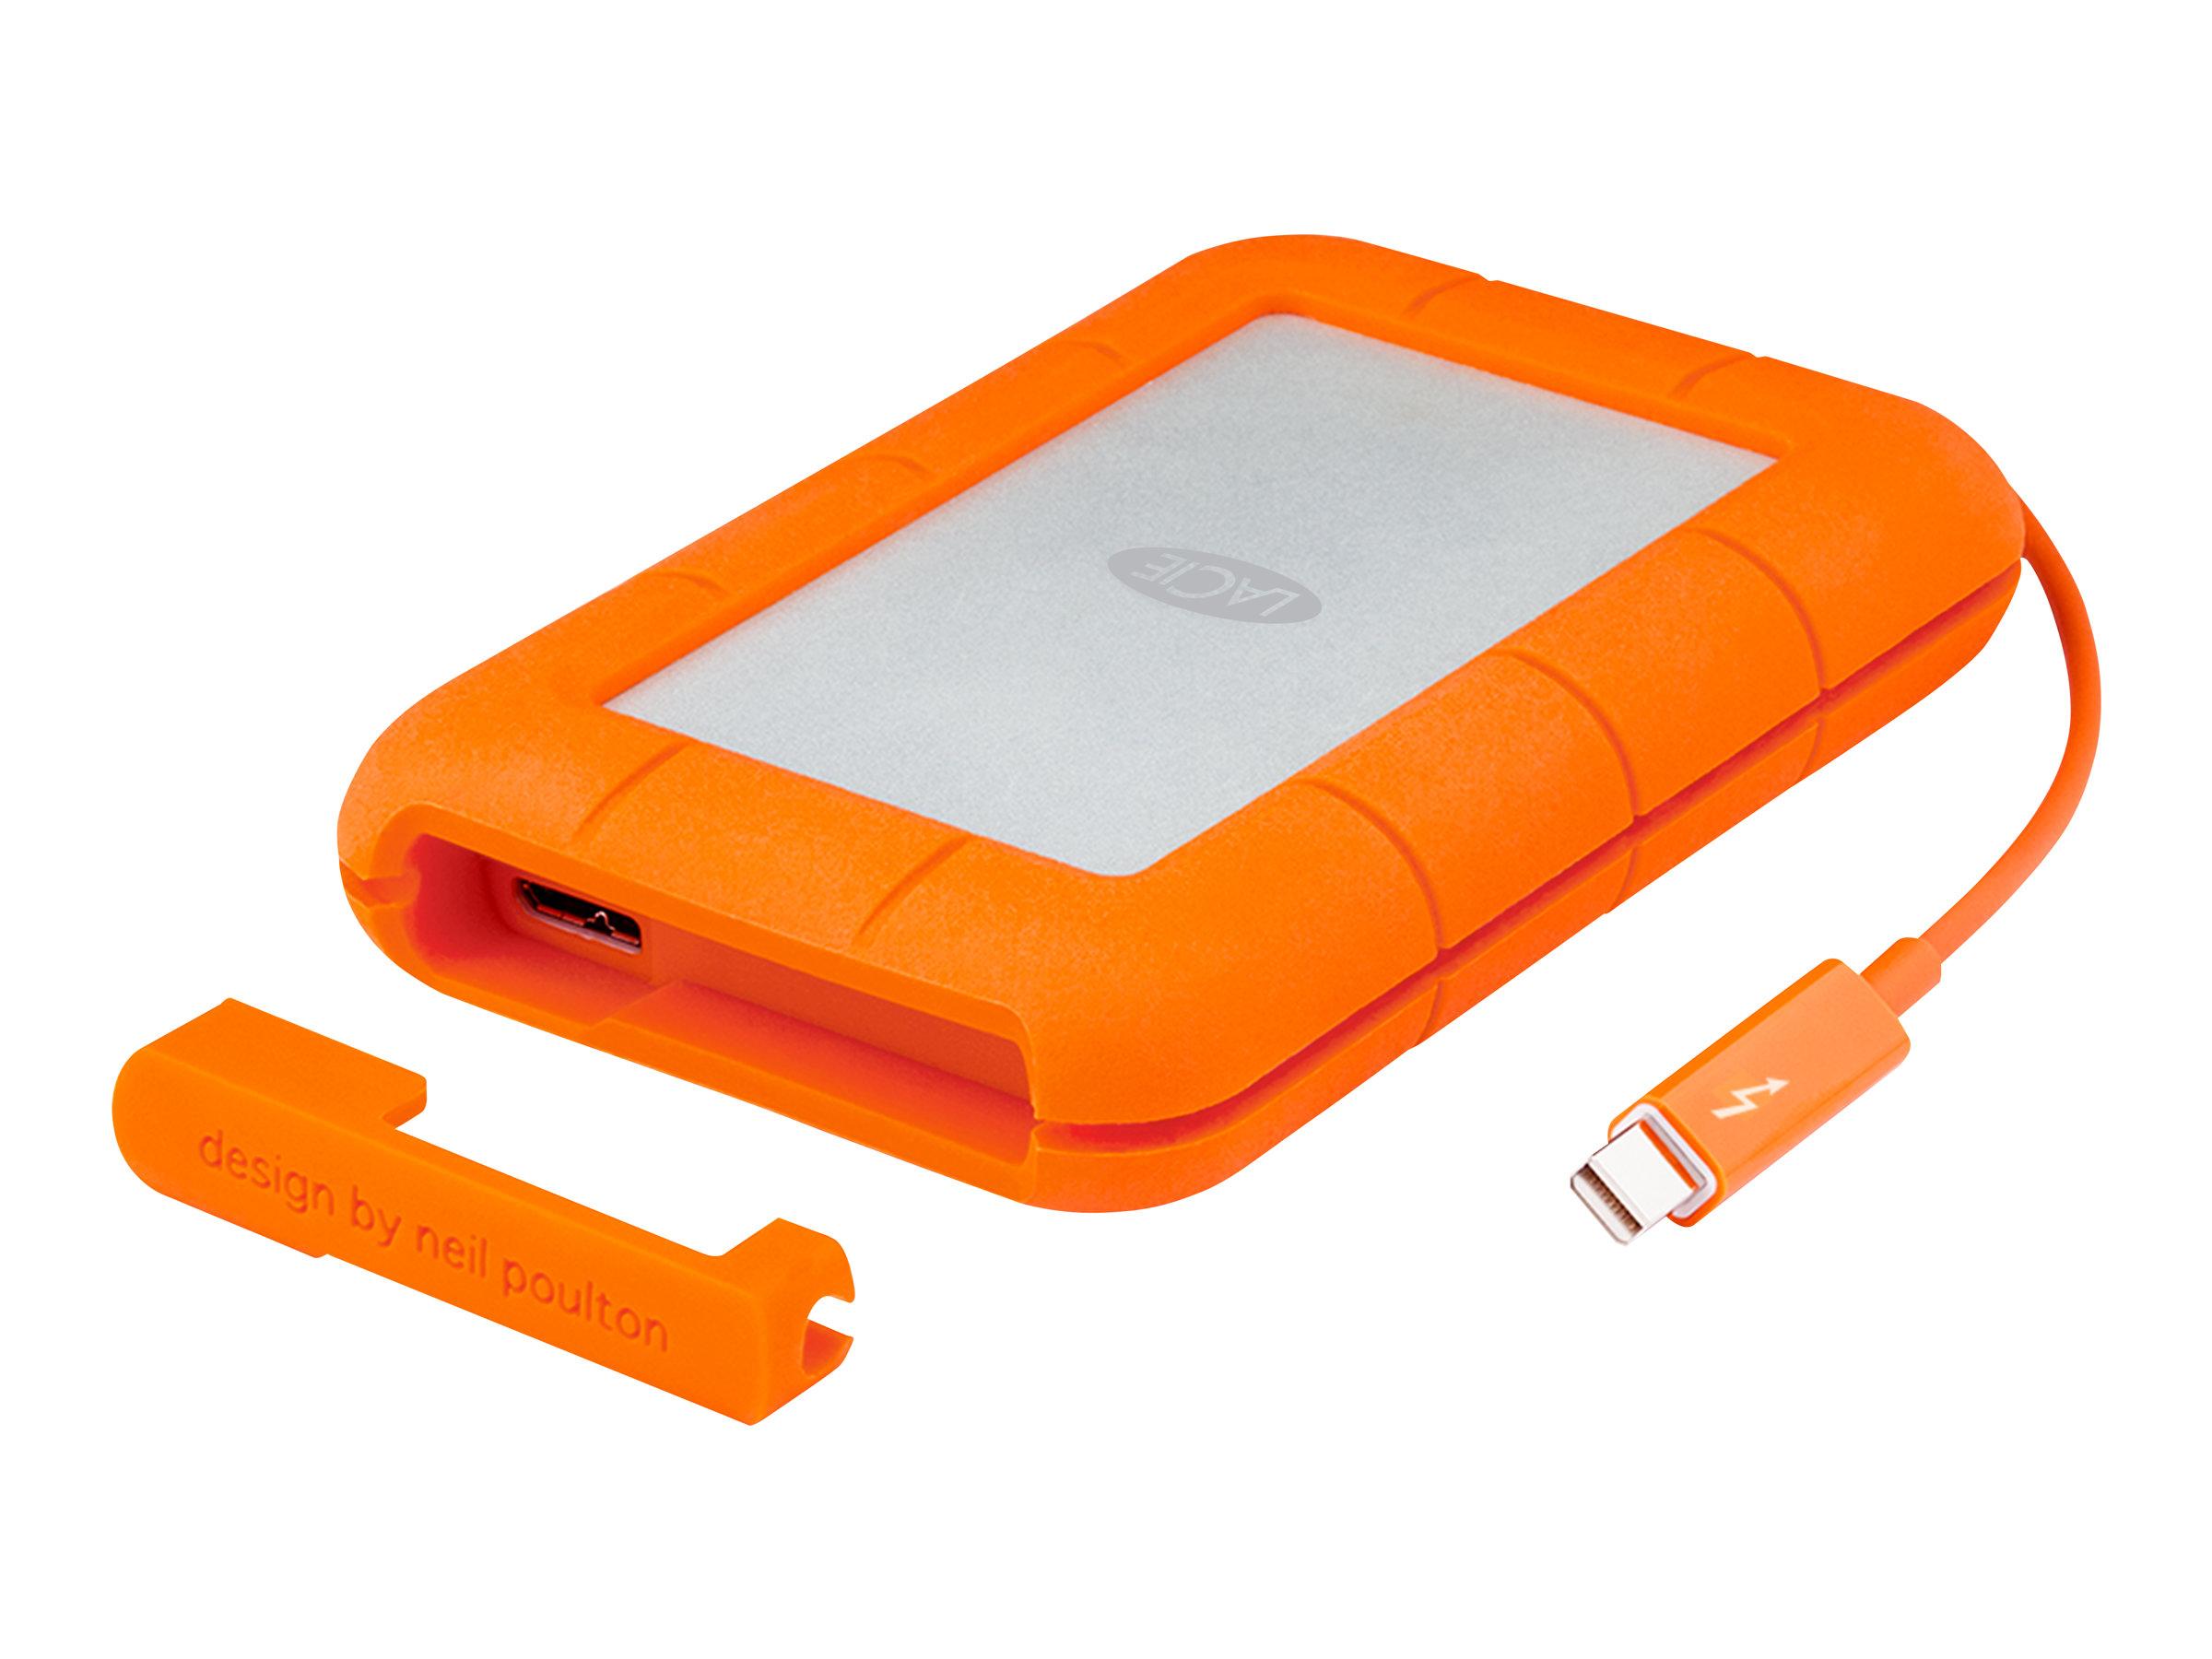 LaCie Rugged Thunderbolt - Festplatte - 2 TB - extern (tragbar) - USB 3.0 / Thunderbolt - 256-Bit-AES